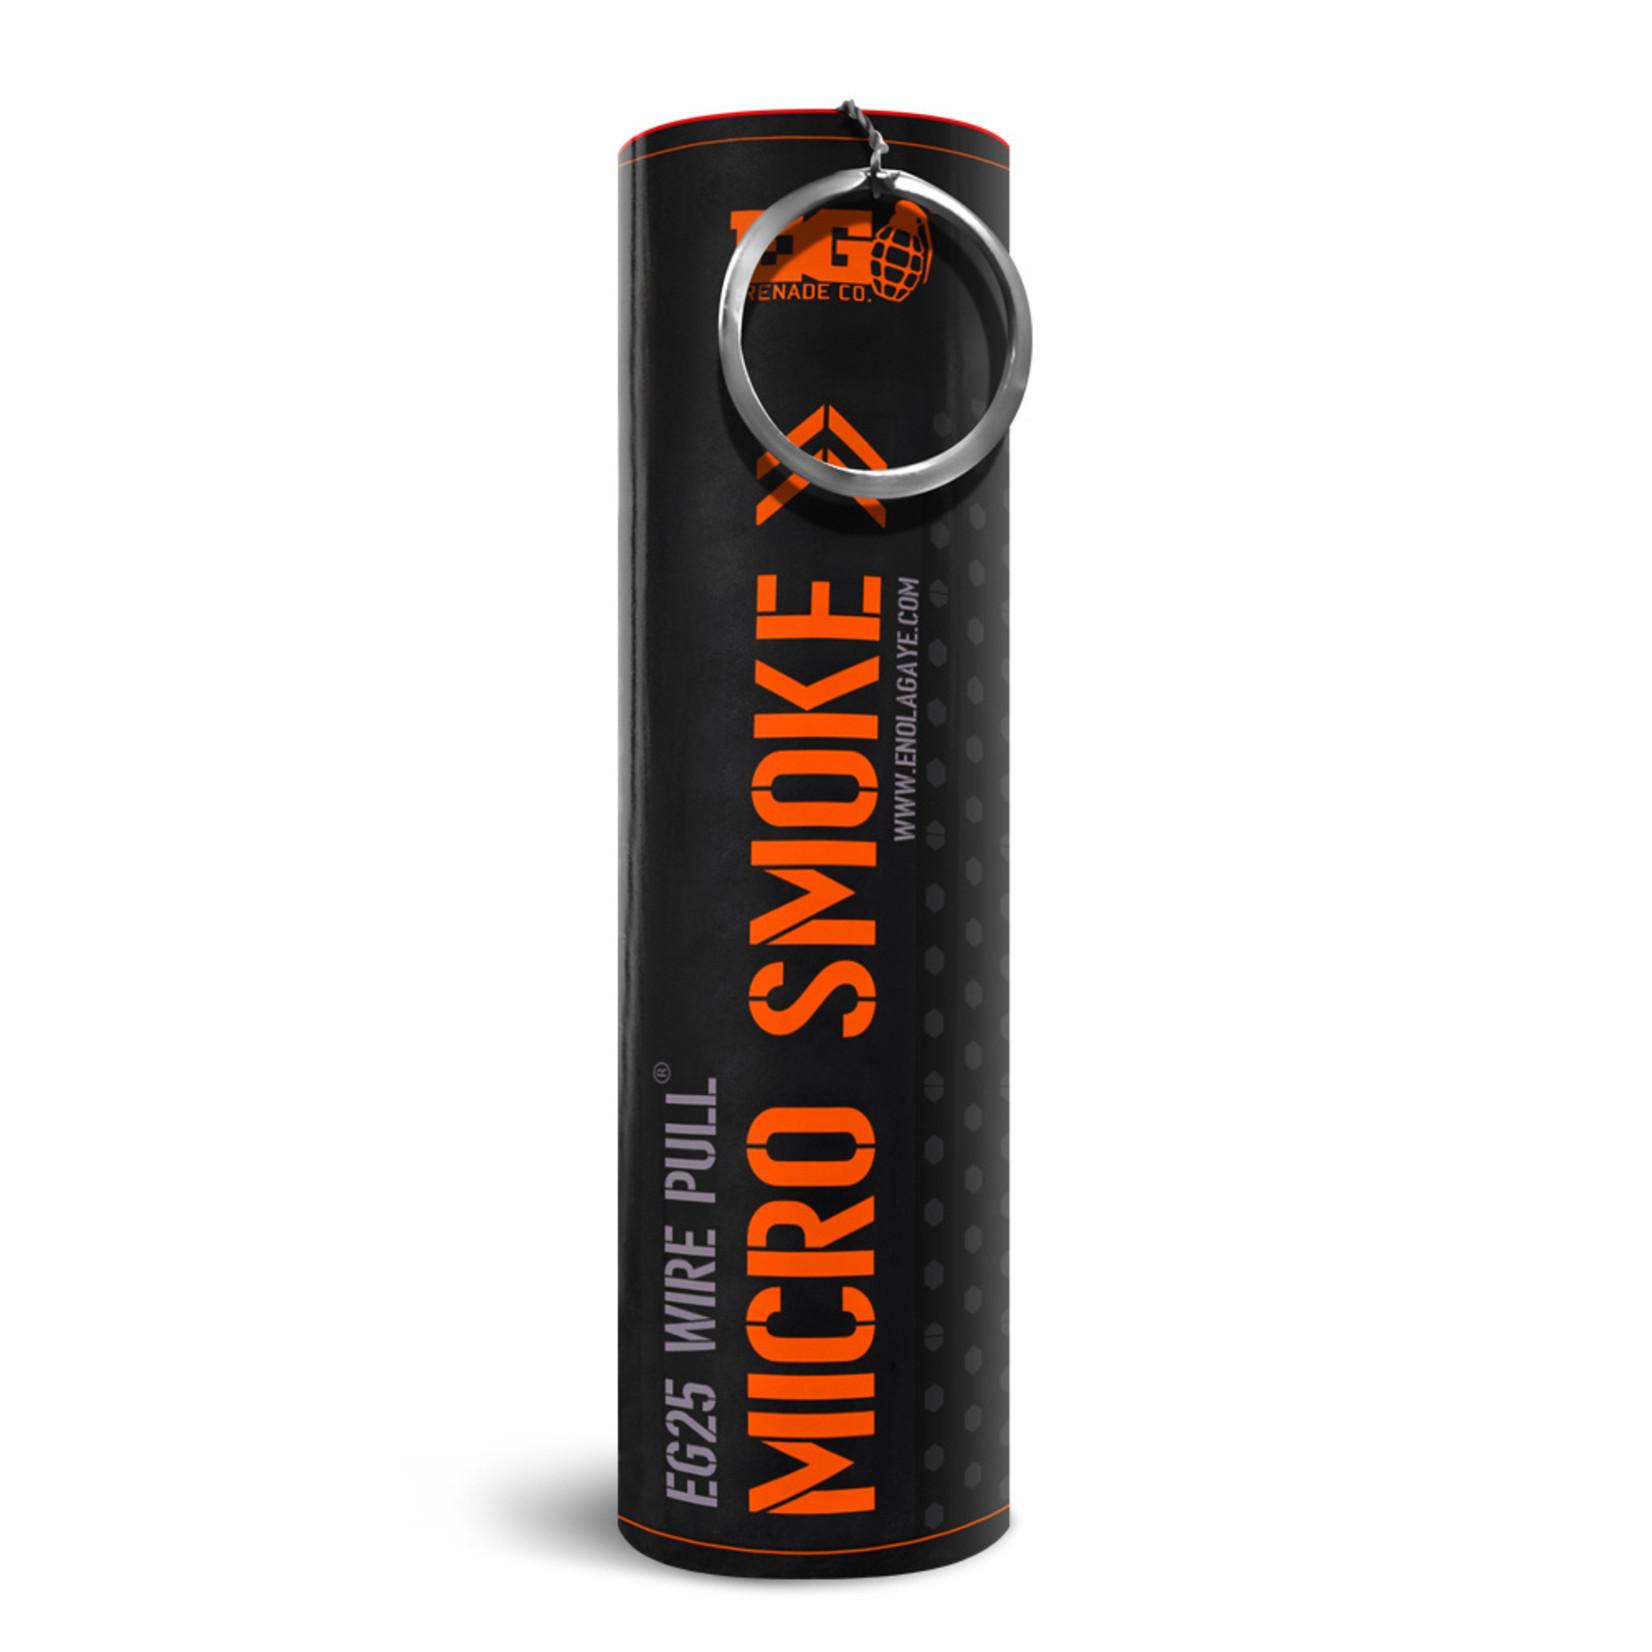 EG25 Micro Smoke Grenade Orange